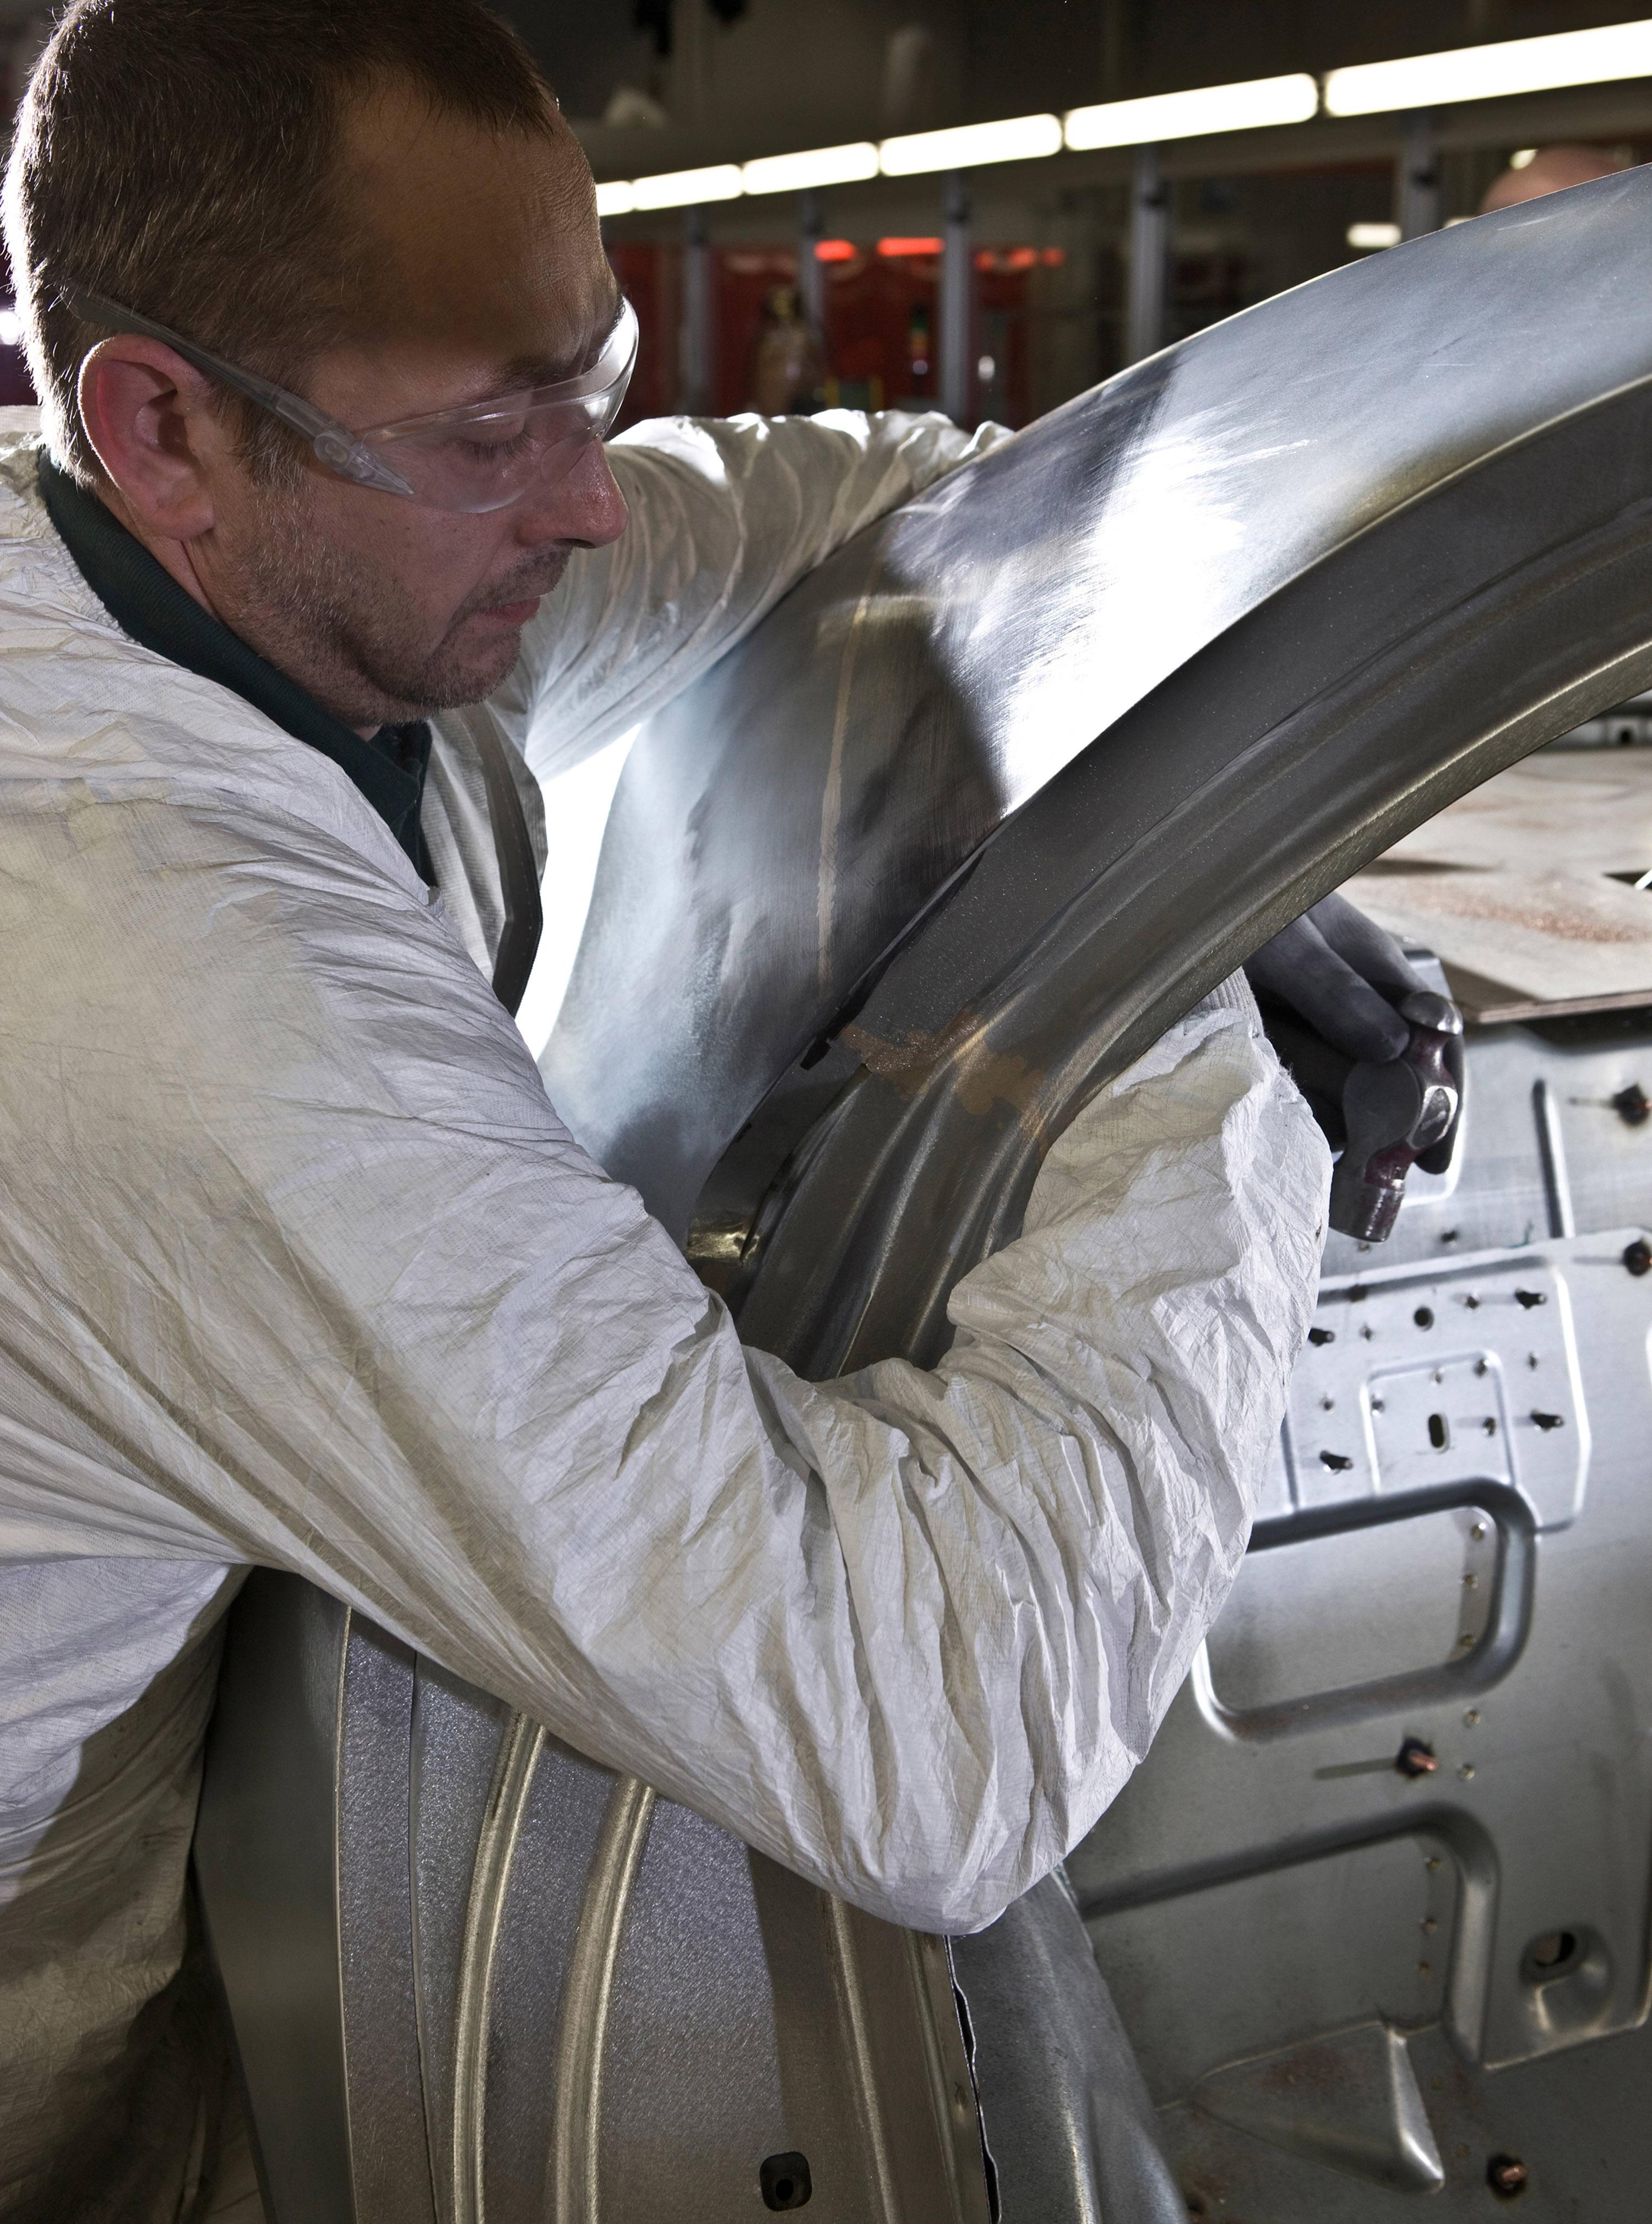 bentley pensions b magazine industrial car action series warned mechanic flying design dealer publish mulsanne of over